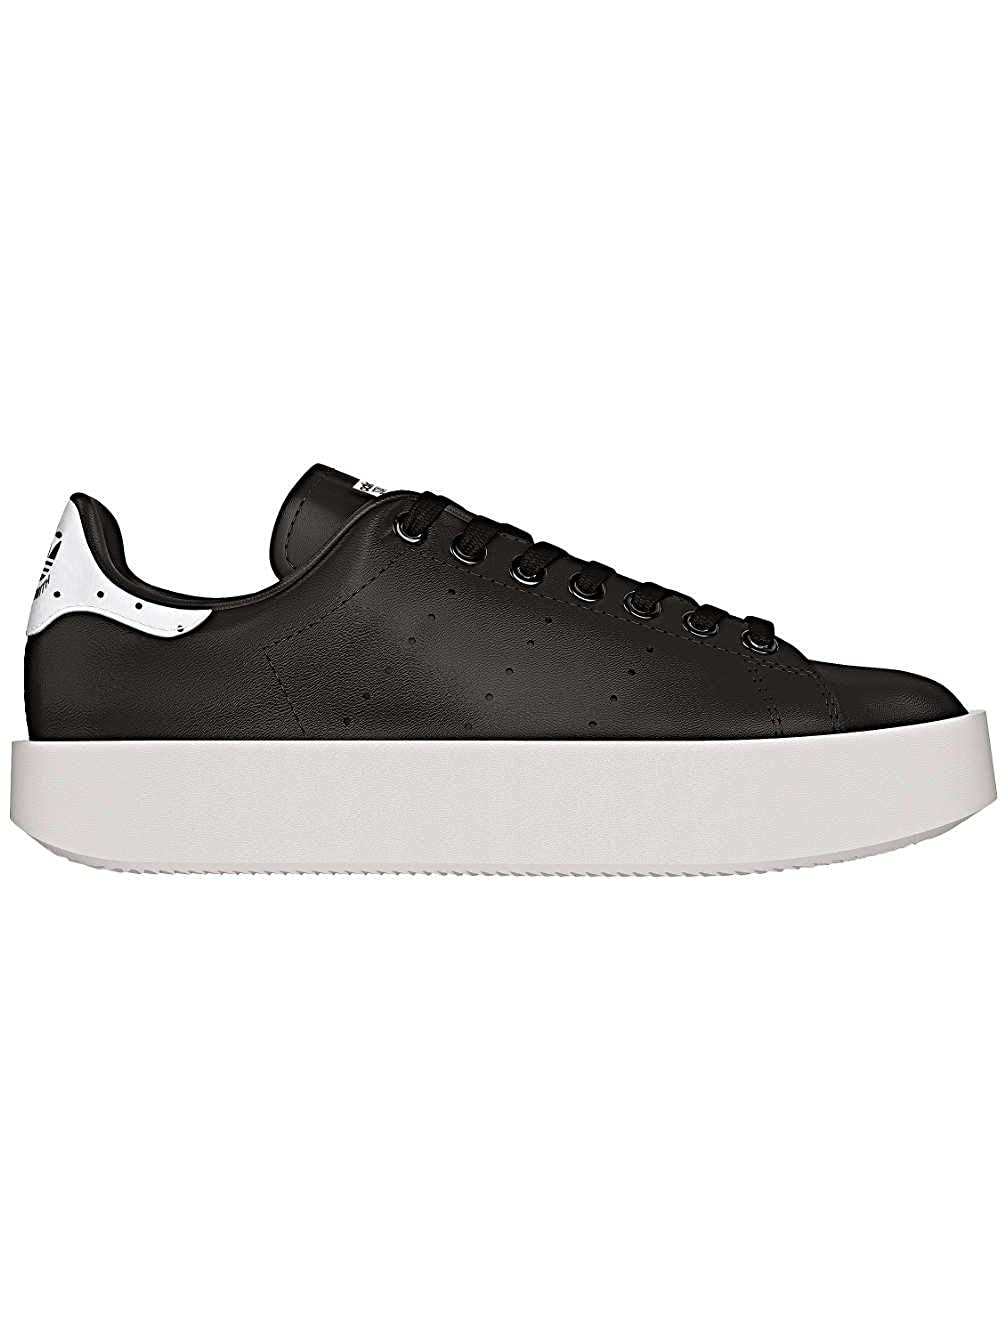 | adidas Women Low Sneakers with BA7772 Platform